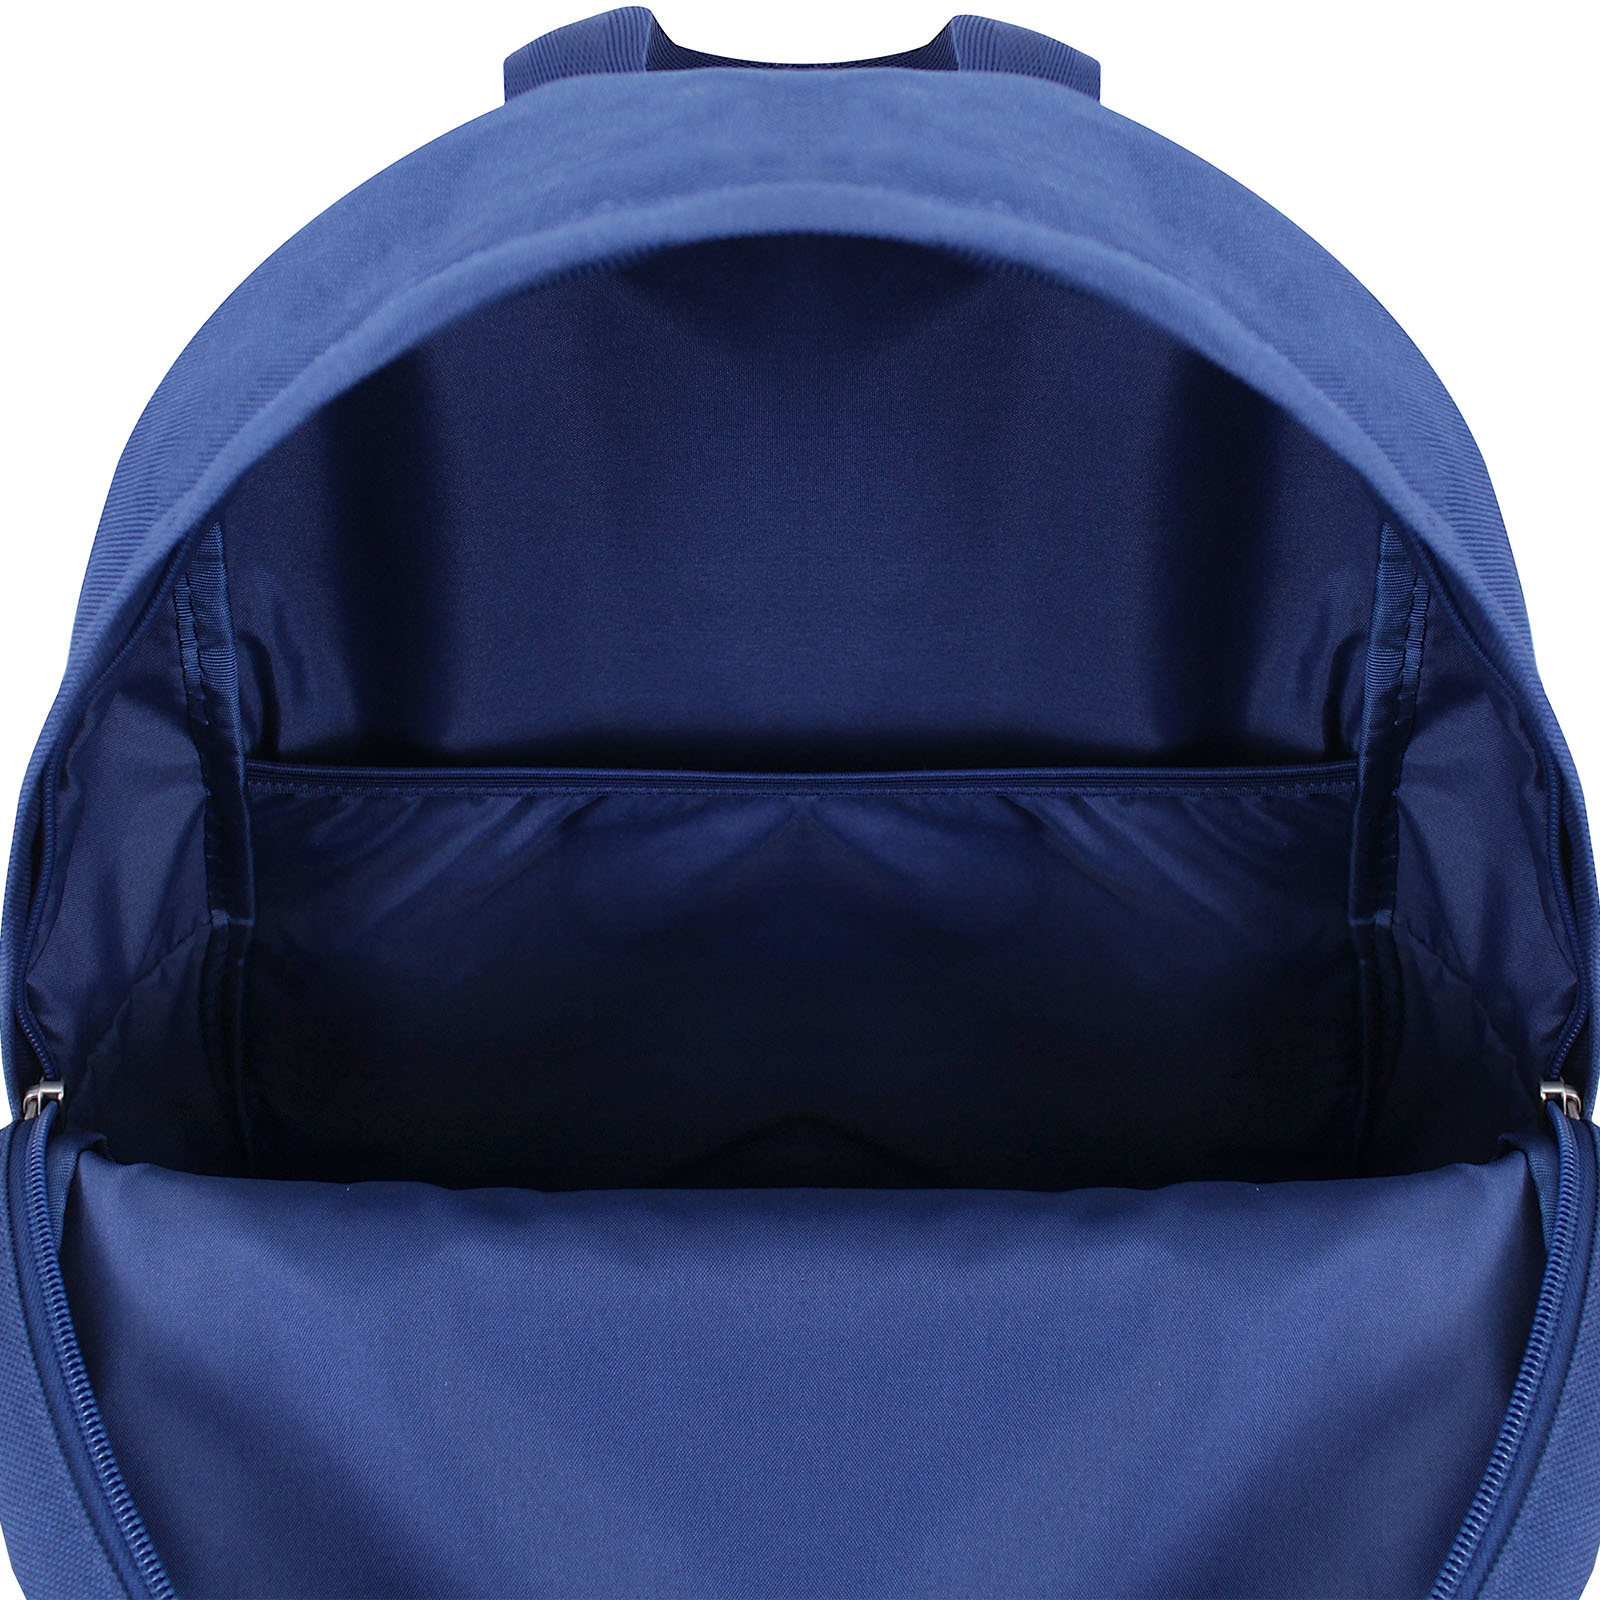 Рюкзак Bagland Молодежный W/R 17 л. Синий 765 (00533662) фото 5